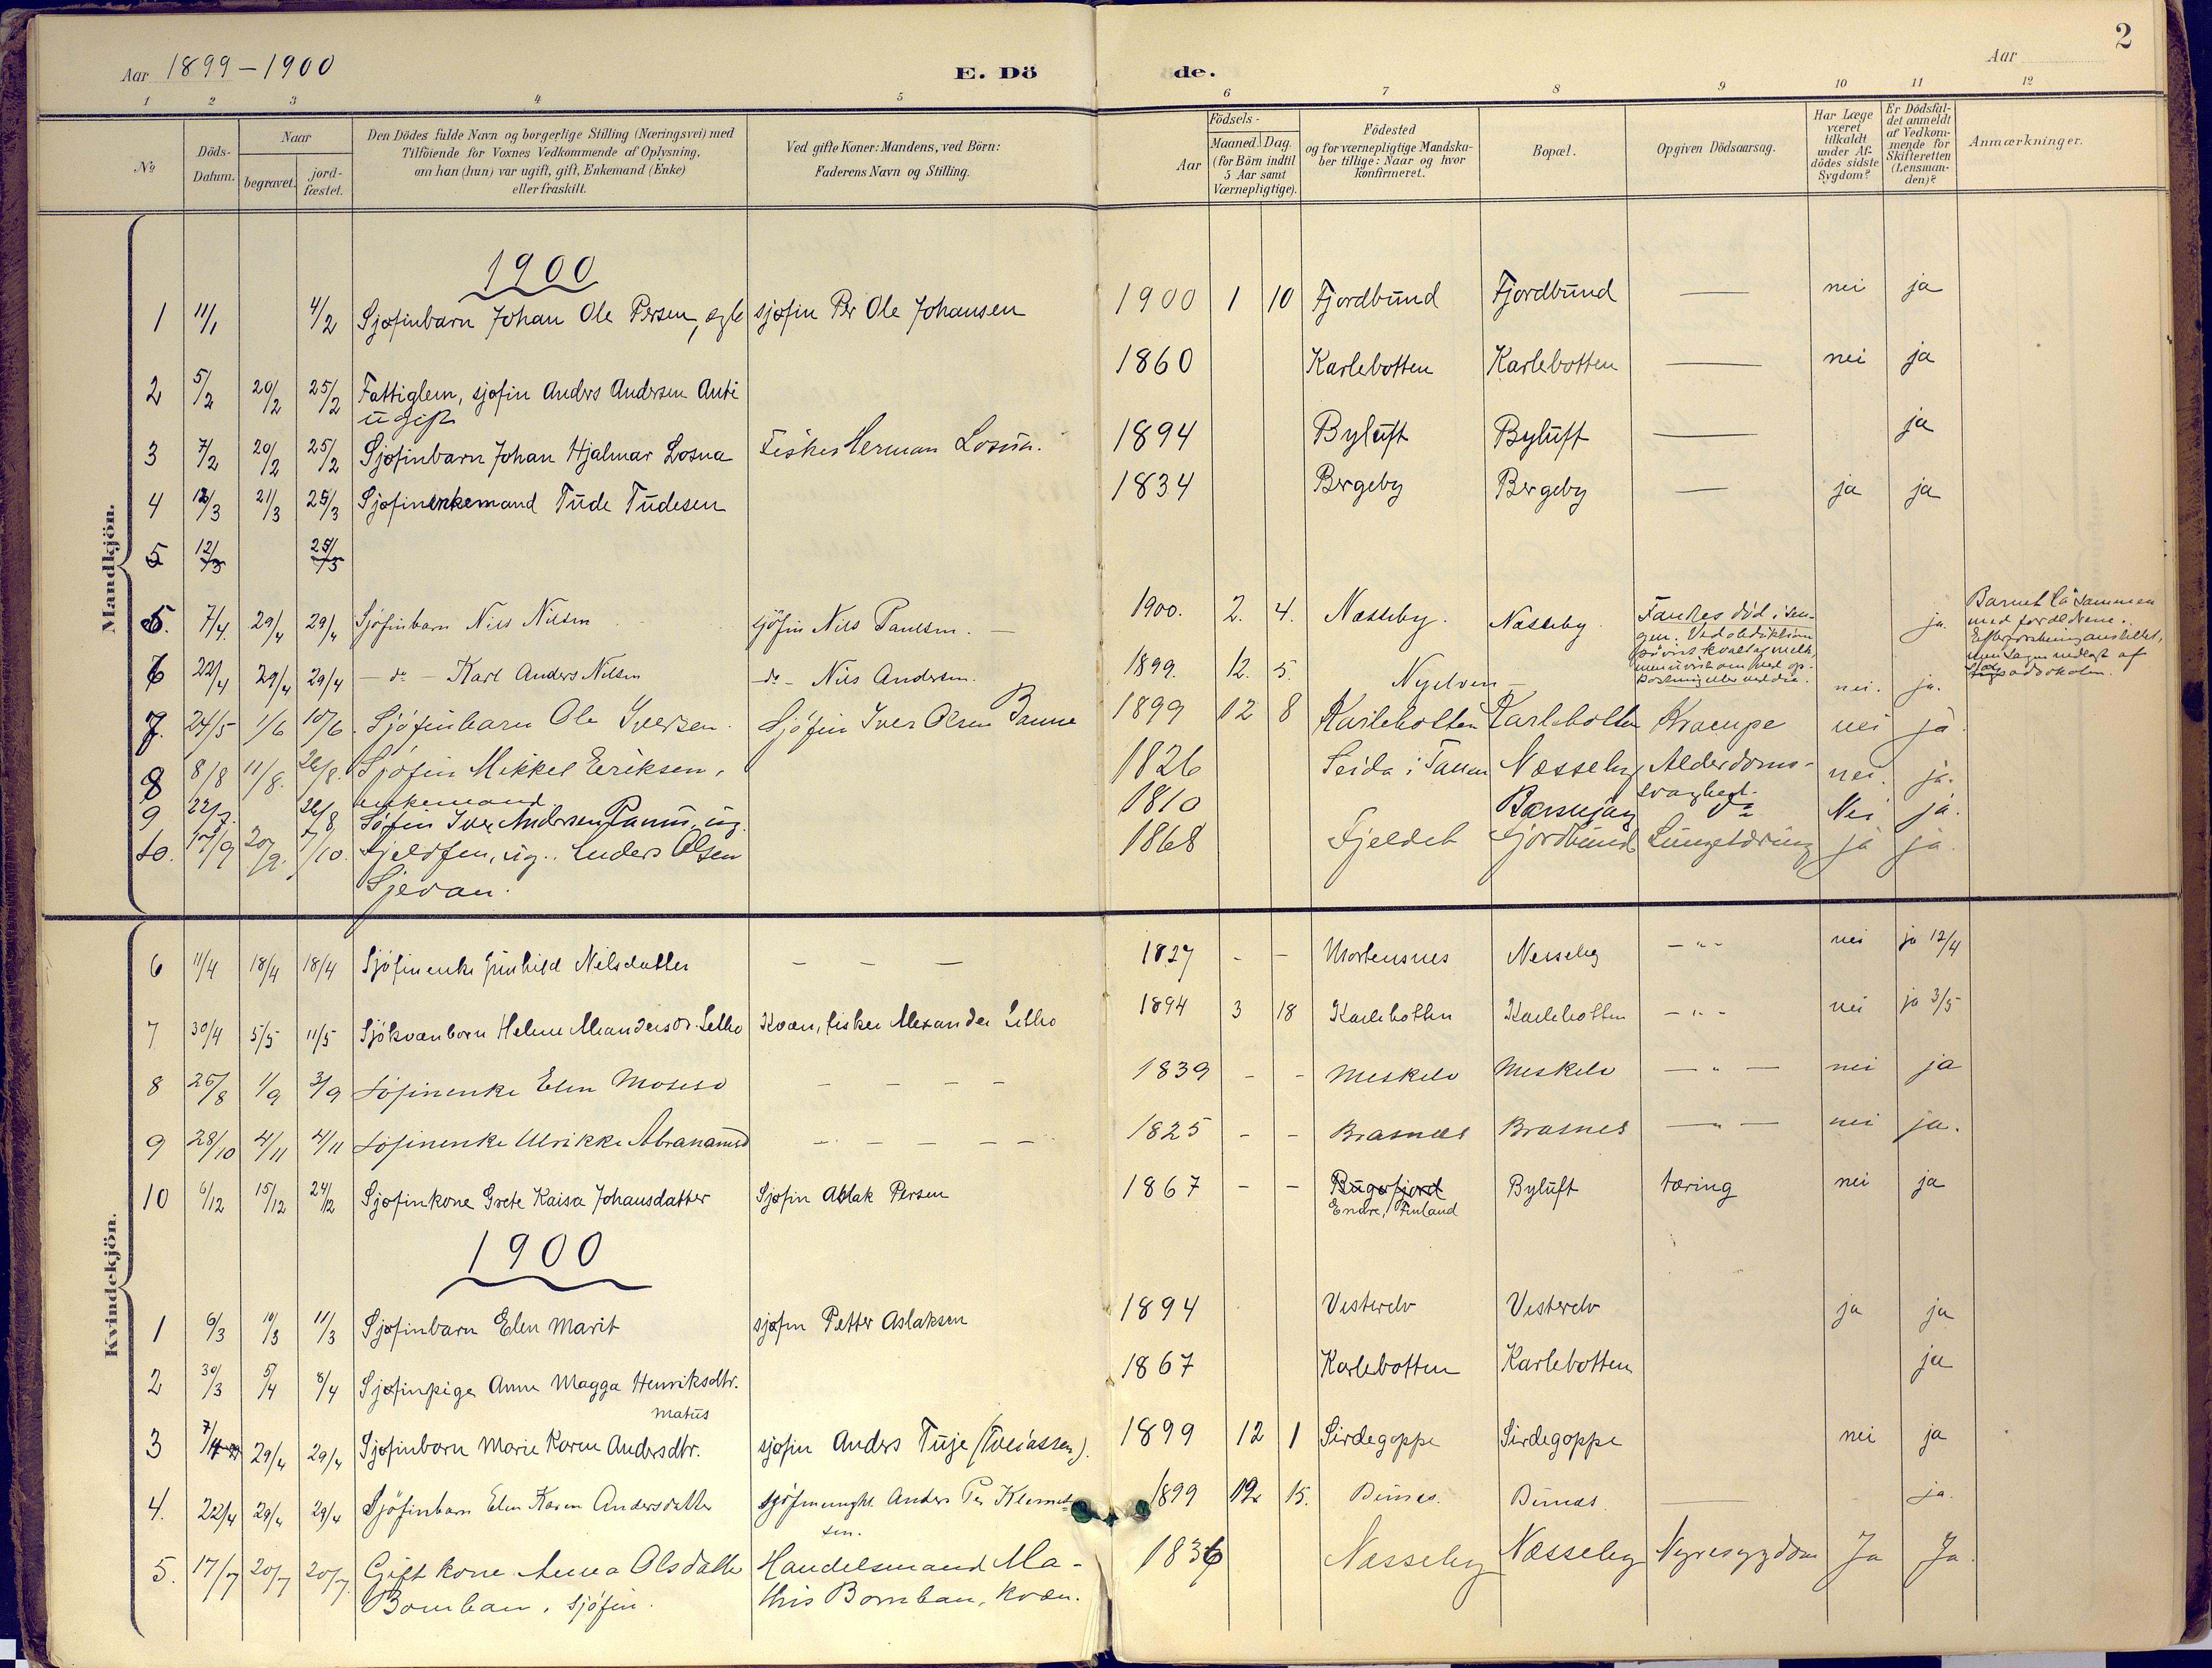 SATØ, Nesseby sokneprestkontor, H/Ha/L0007kirke: Ministerialbok nr. 7, 1898-1921, s. 2